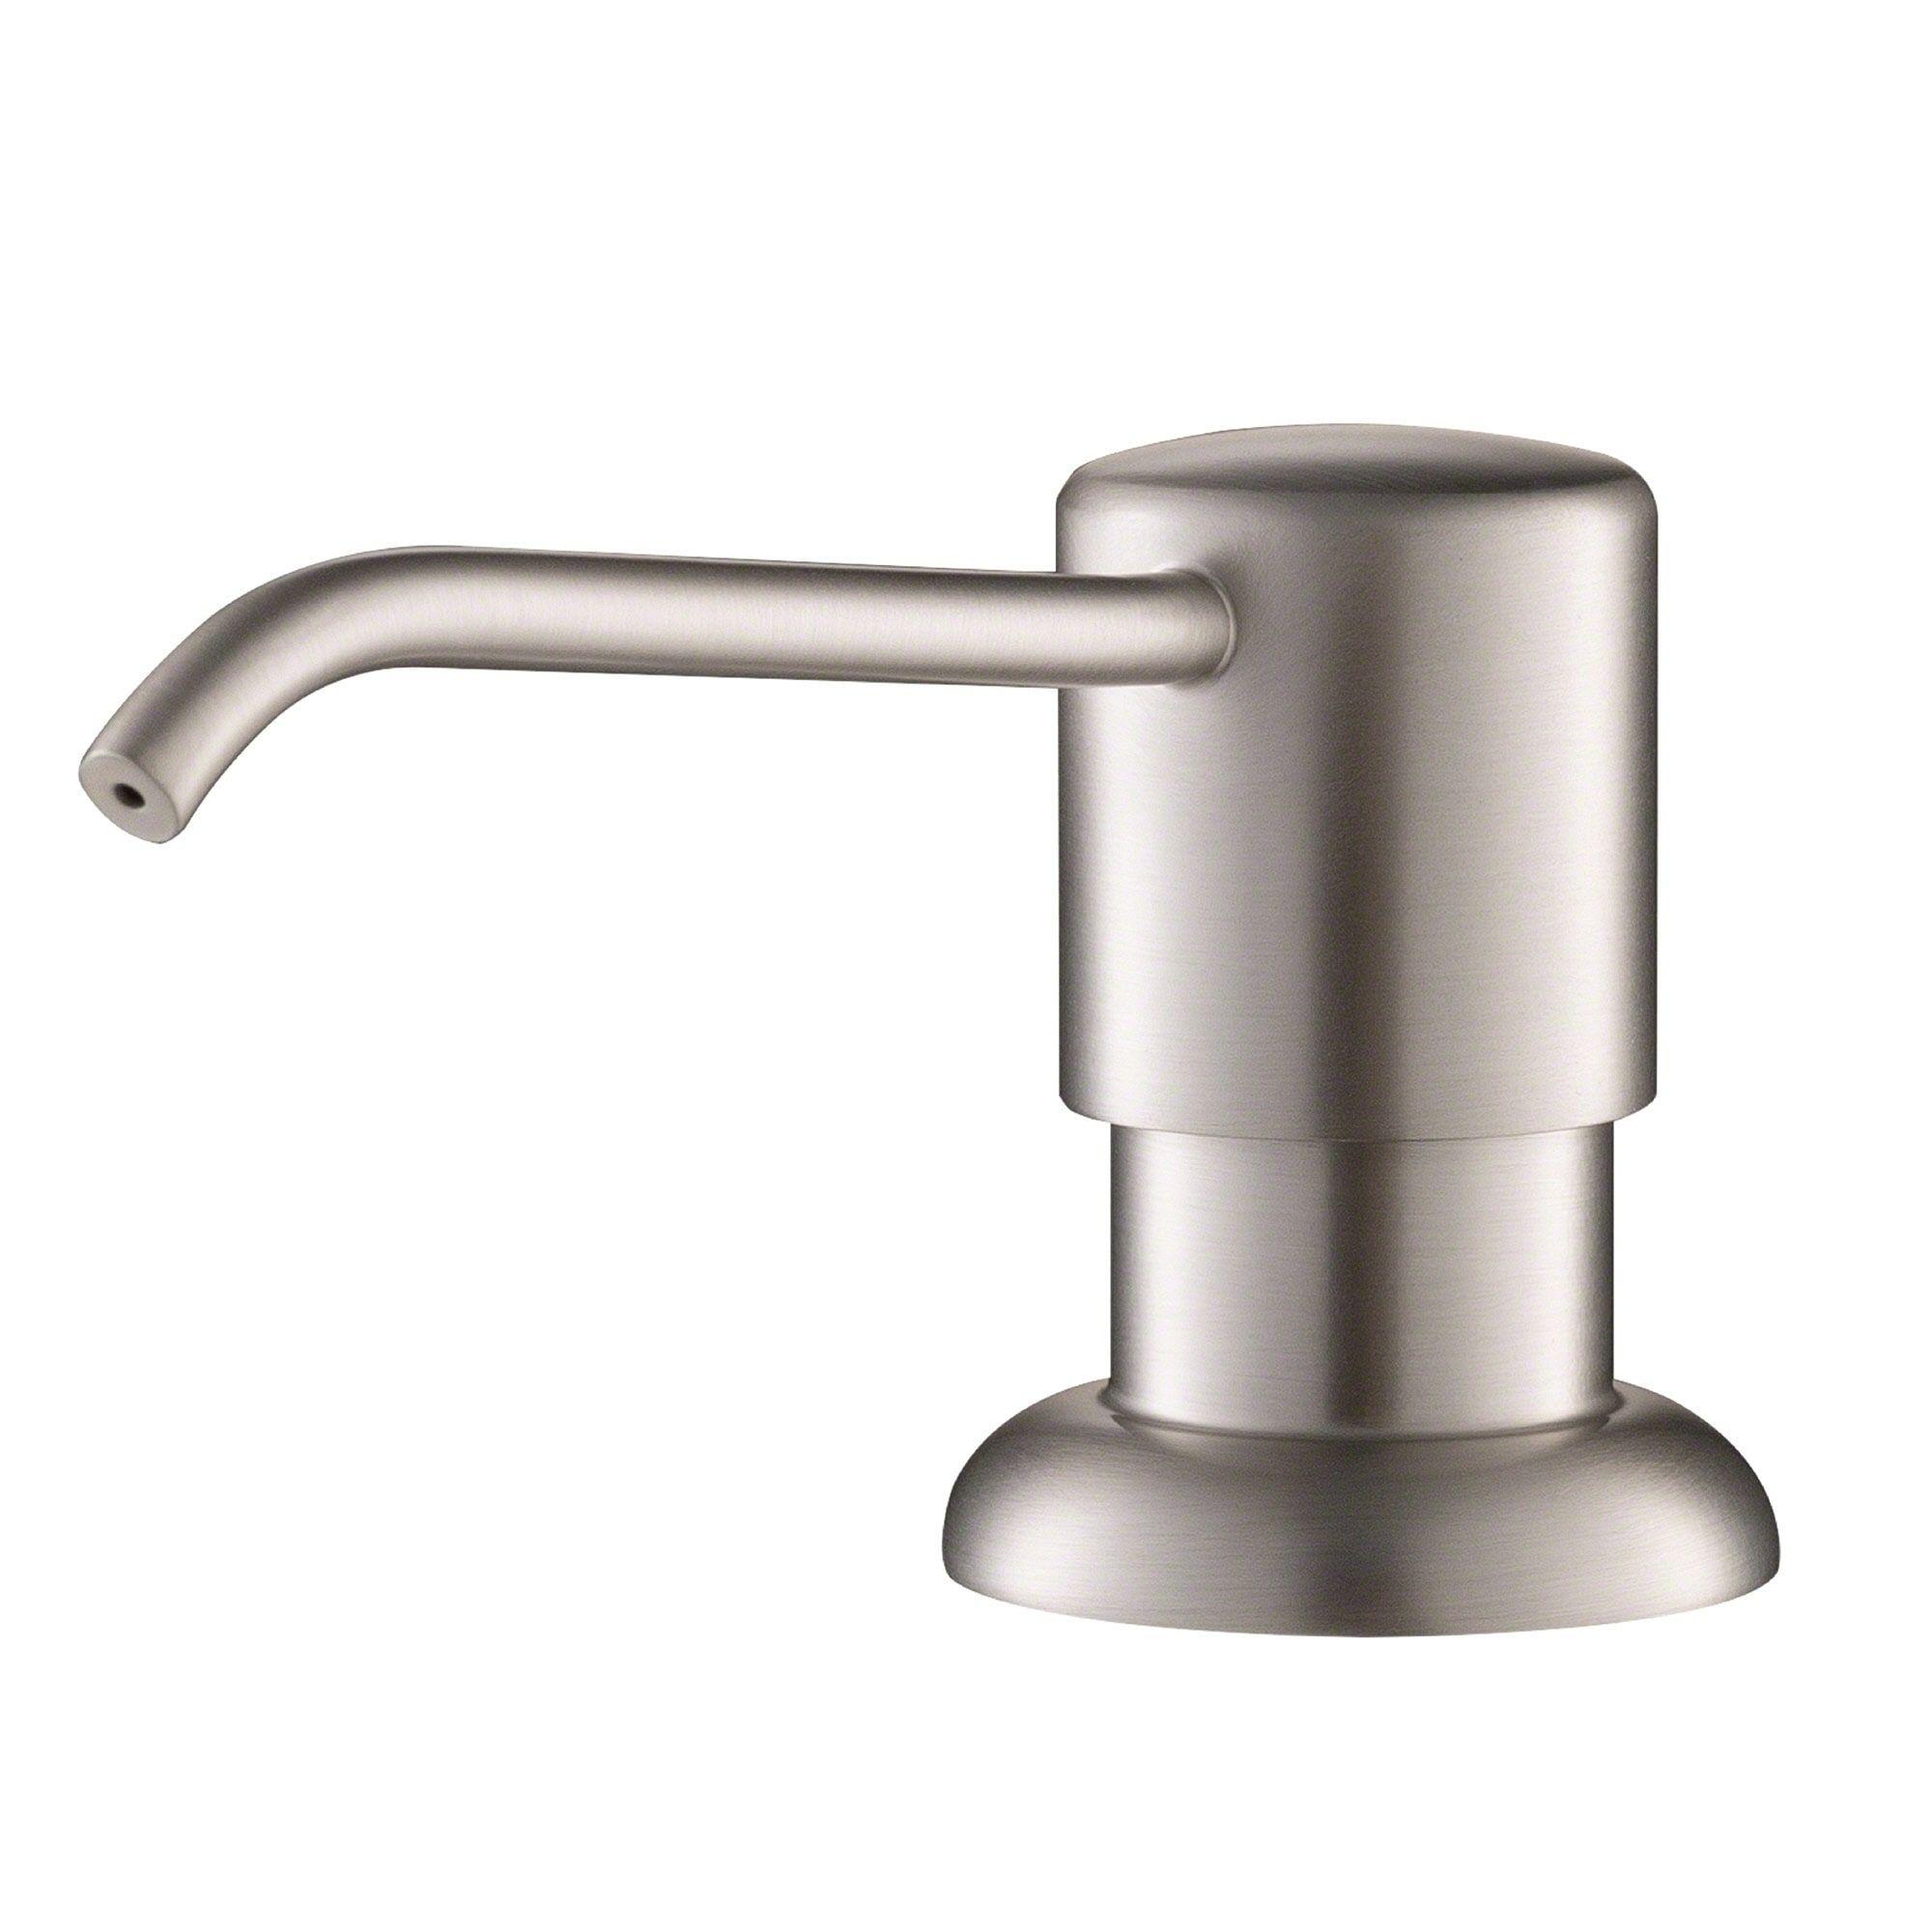 KRAUS KSD-41 Kitchen Soap Dispenser Silver